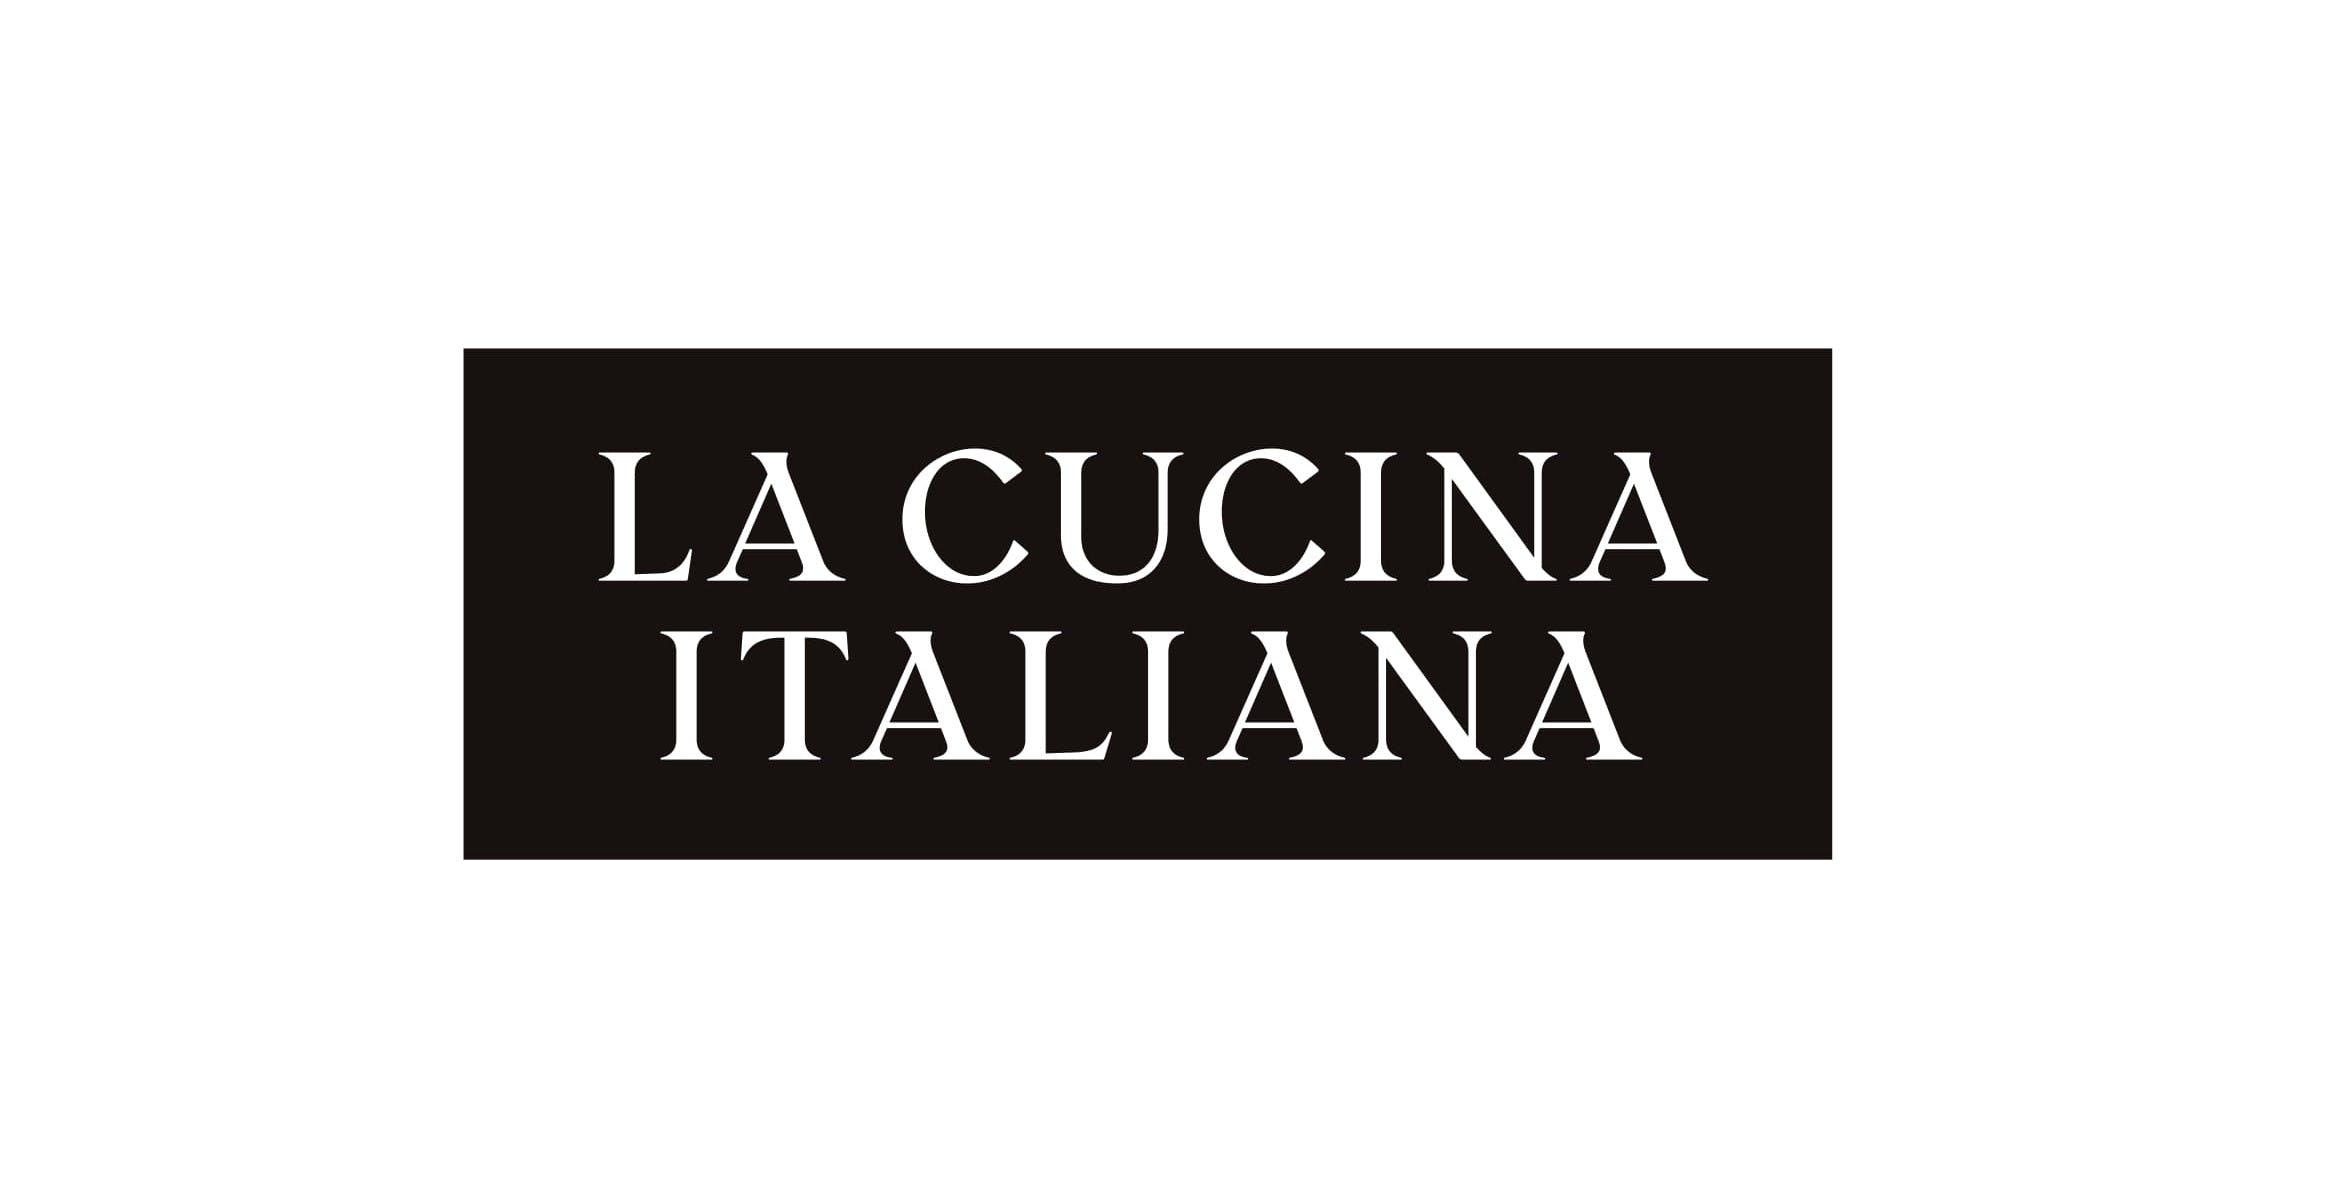 LaCucinaItalianaNewLogo-1